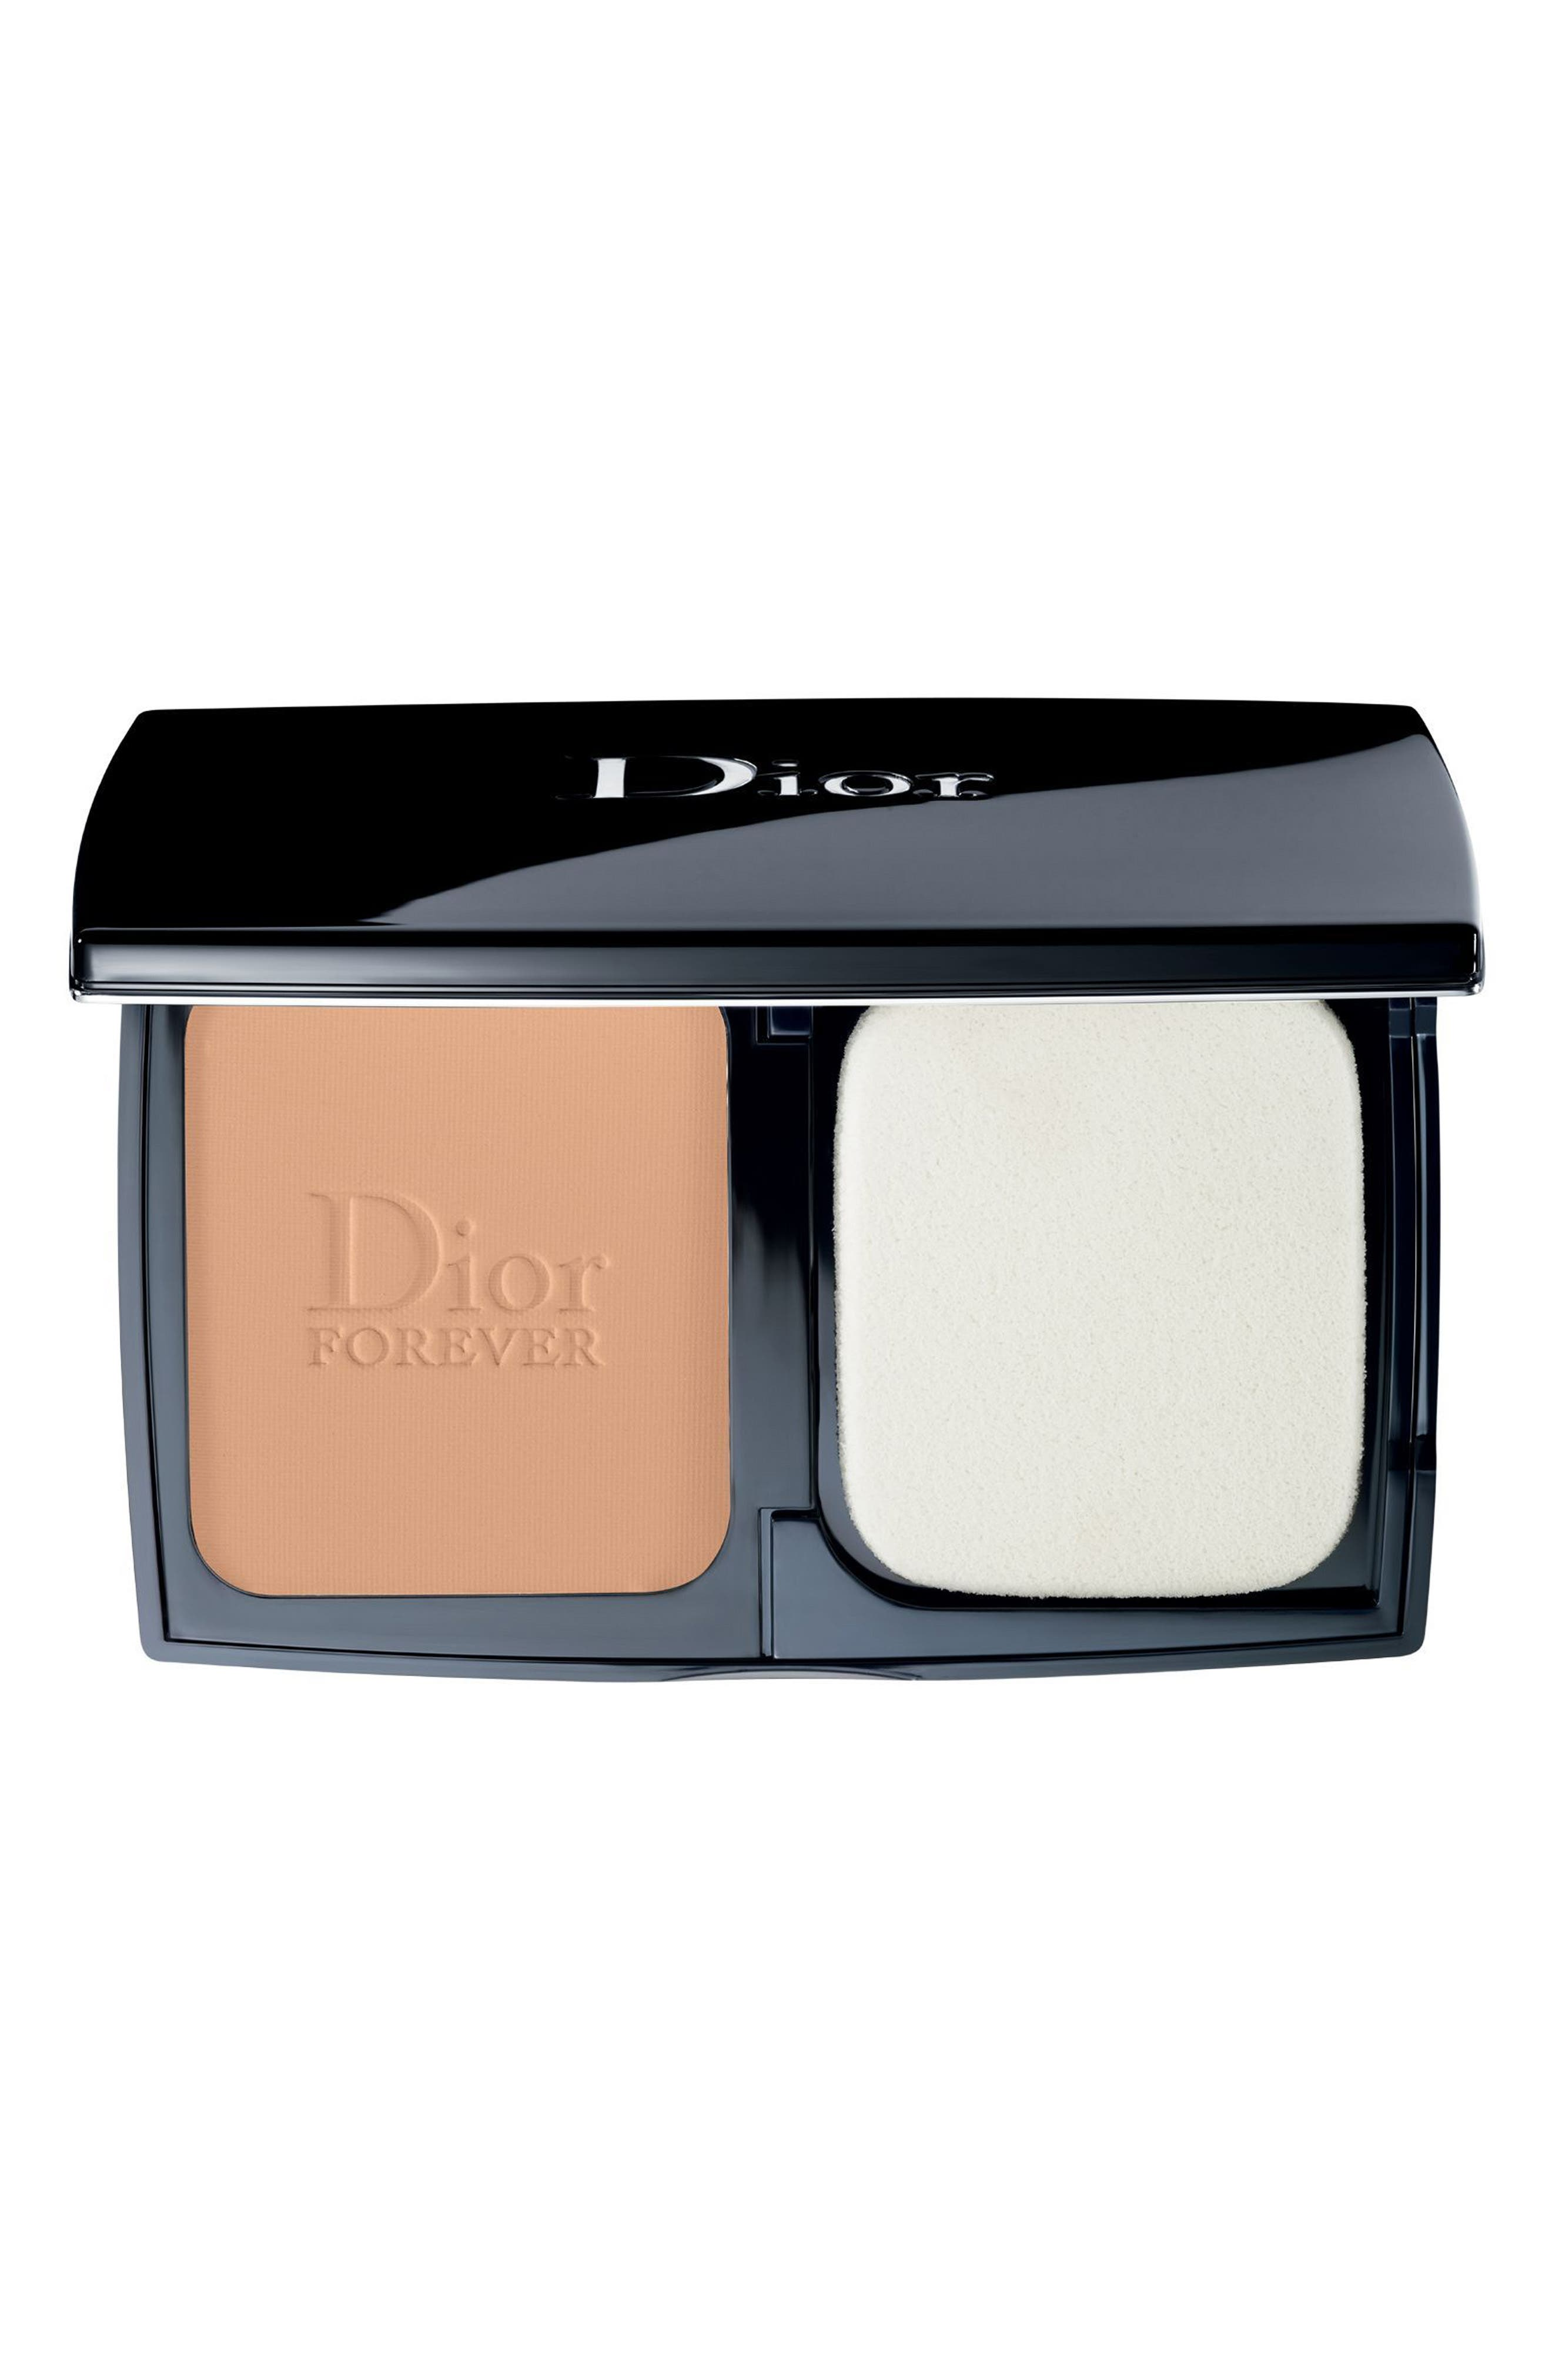 Dior Diorskin Forever Extreme Control - 030 Medium Beige